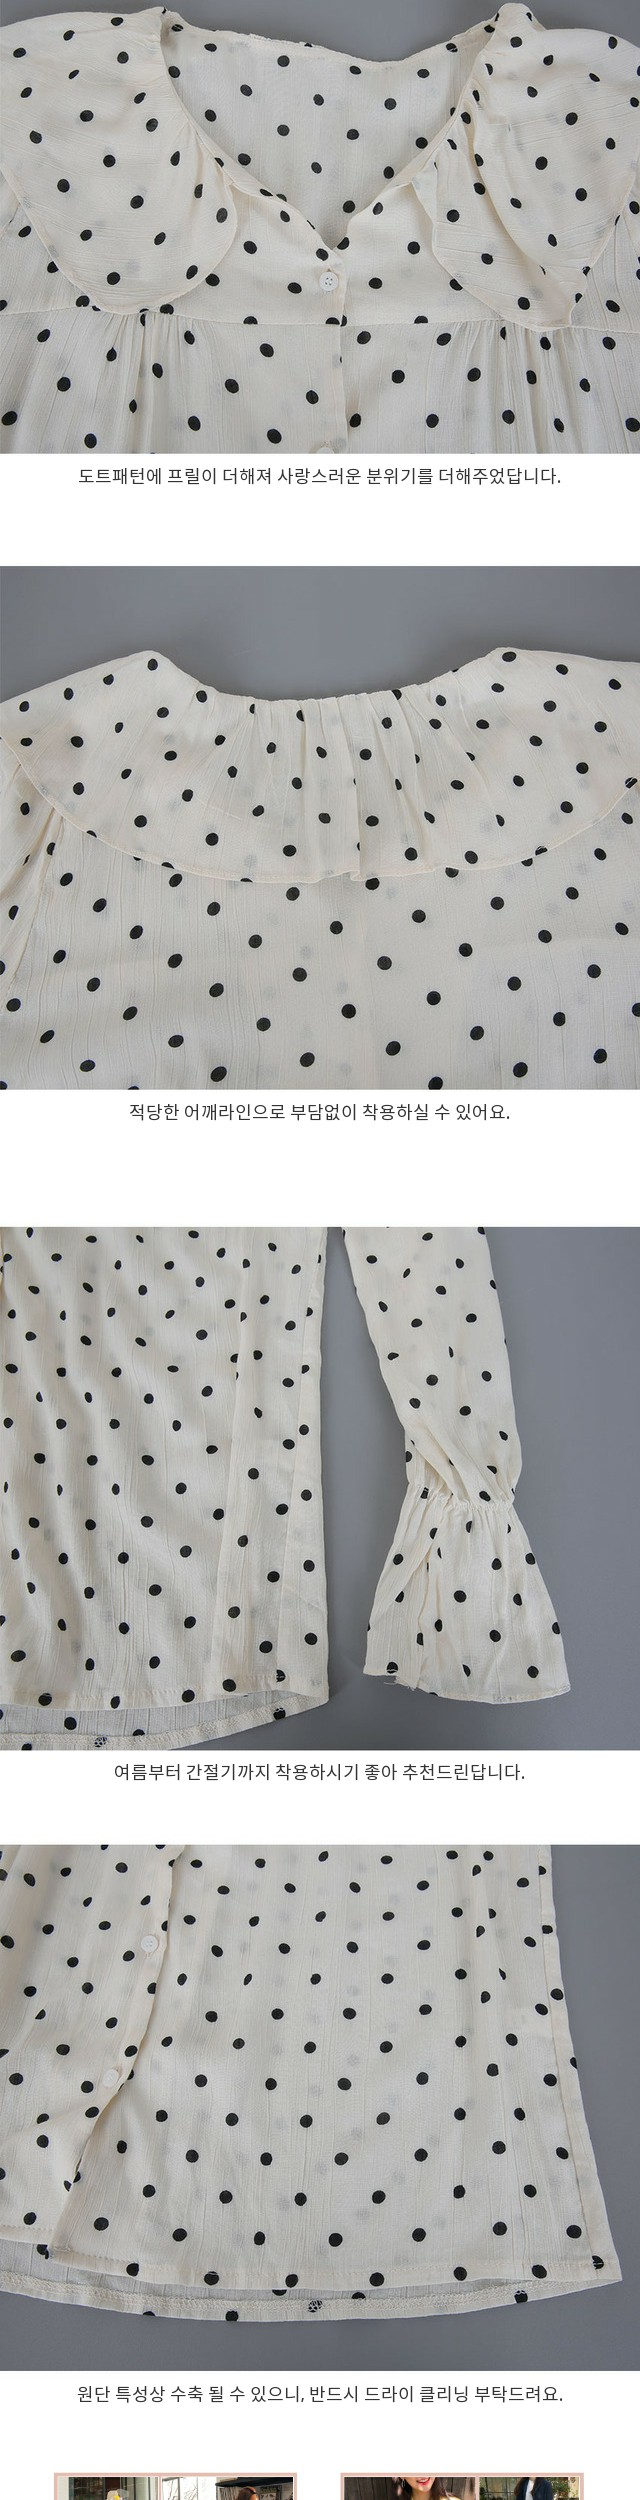 Sweetie-blouse